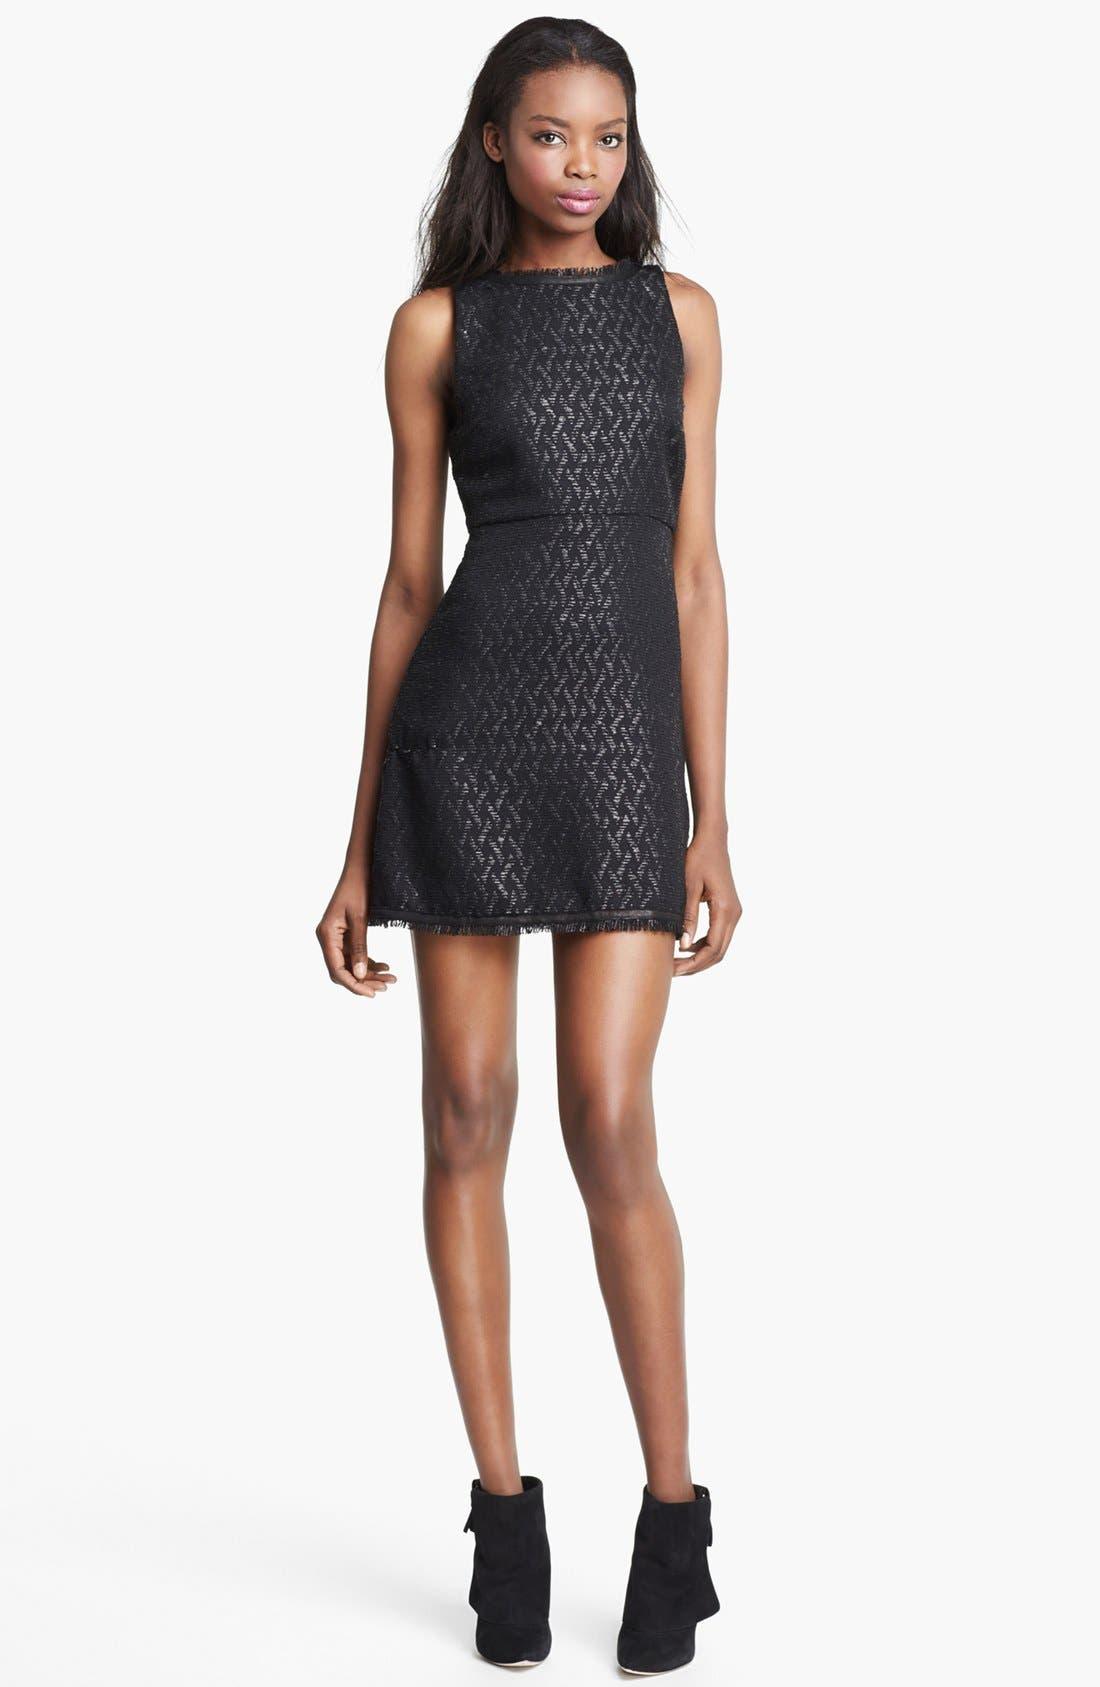 Alternate Image 1 Selected - Alice + Olivia 'Sardo' Leather Detail Dress